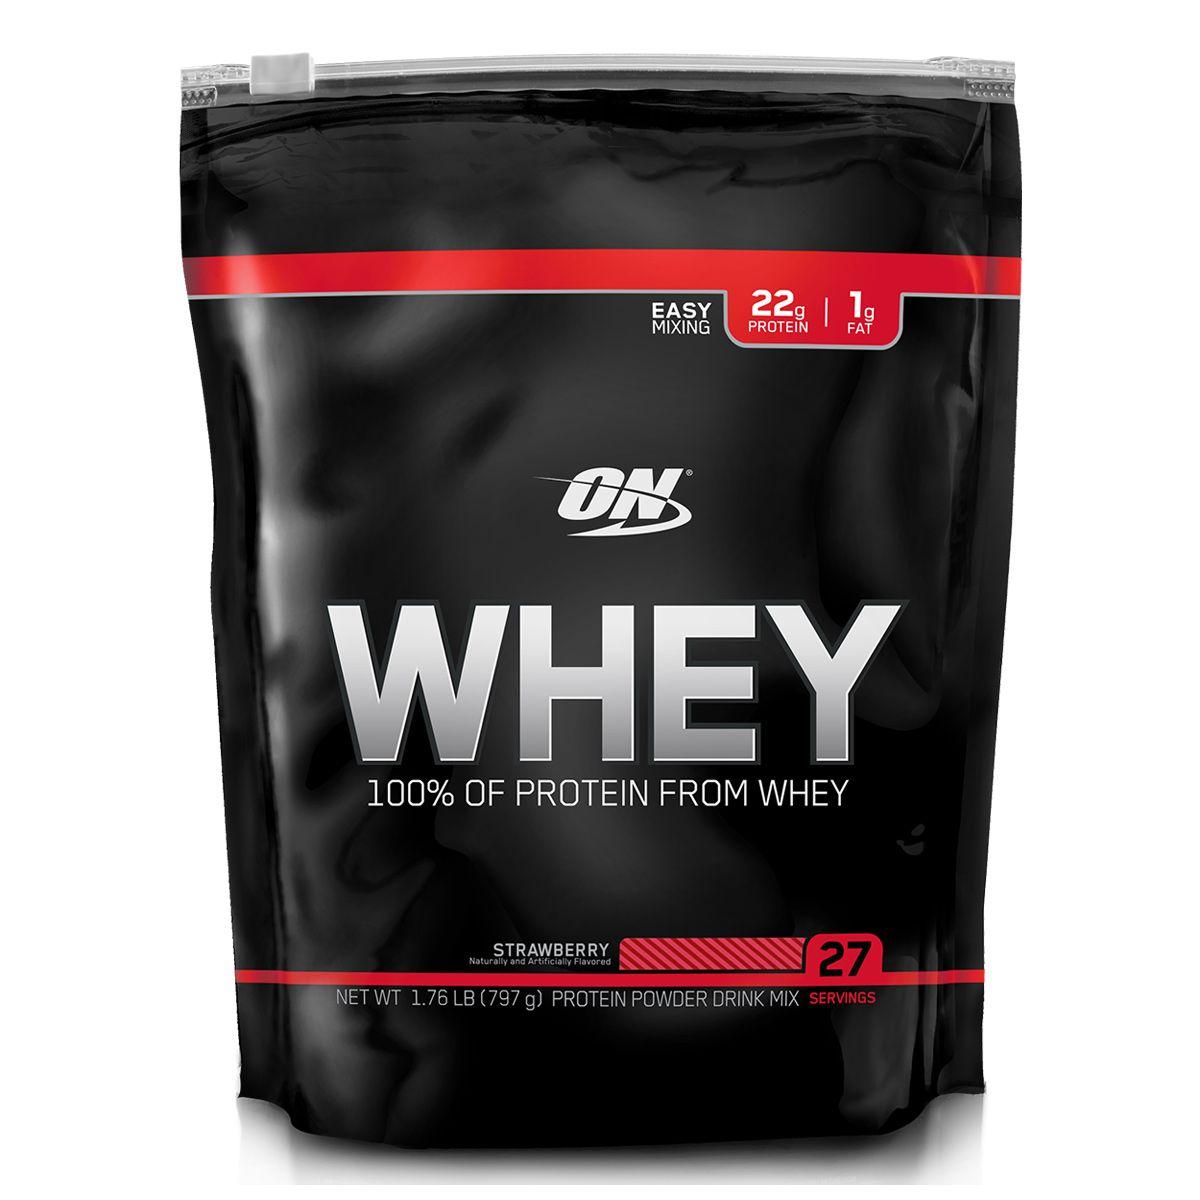 Whey 100% Of Protein ON 797g Optimum